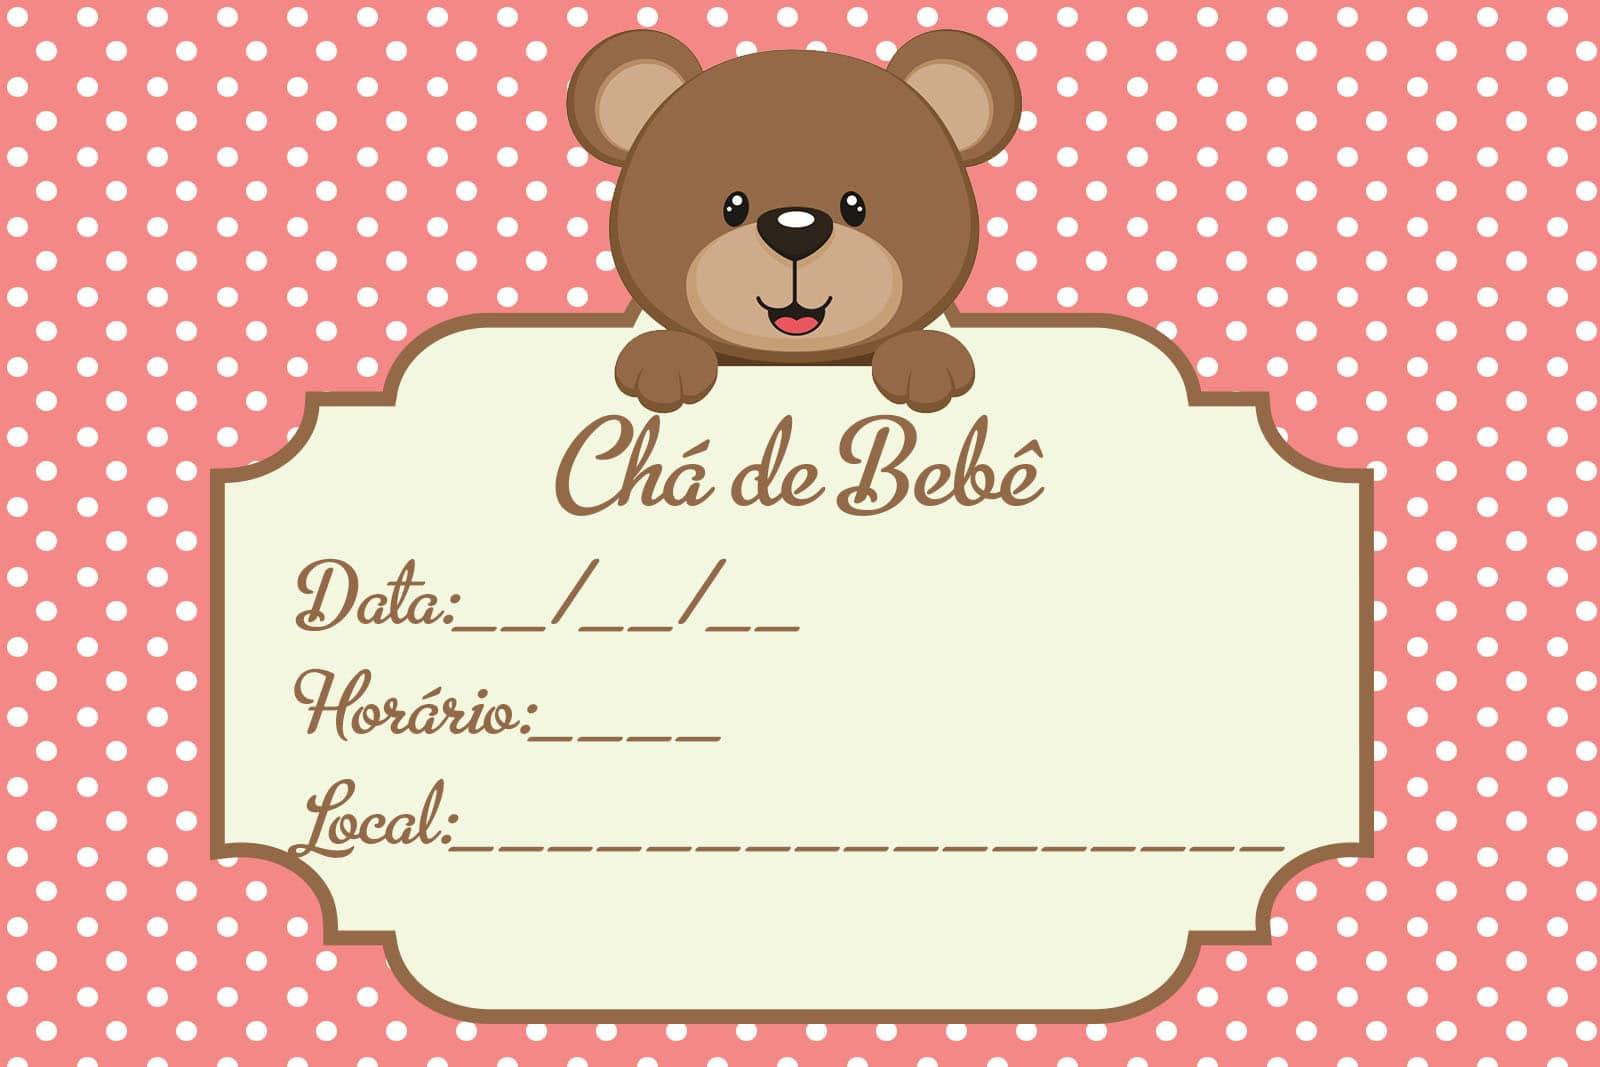 frases para o convite de chá de bebê